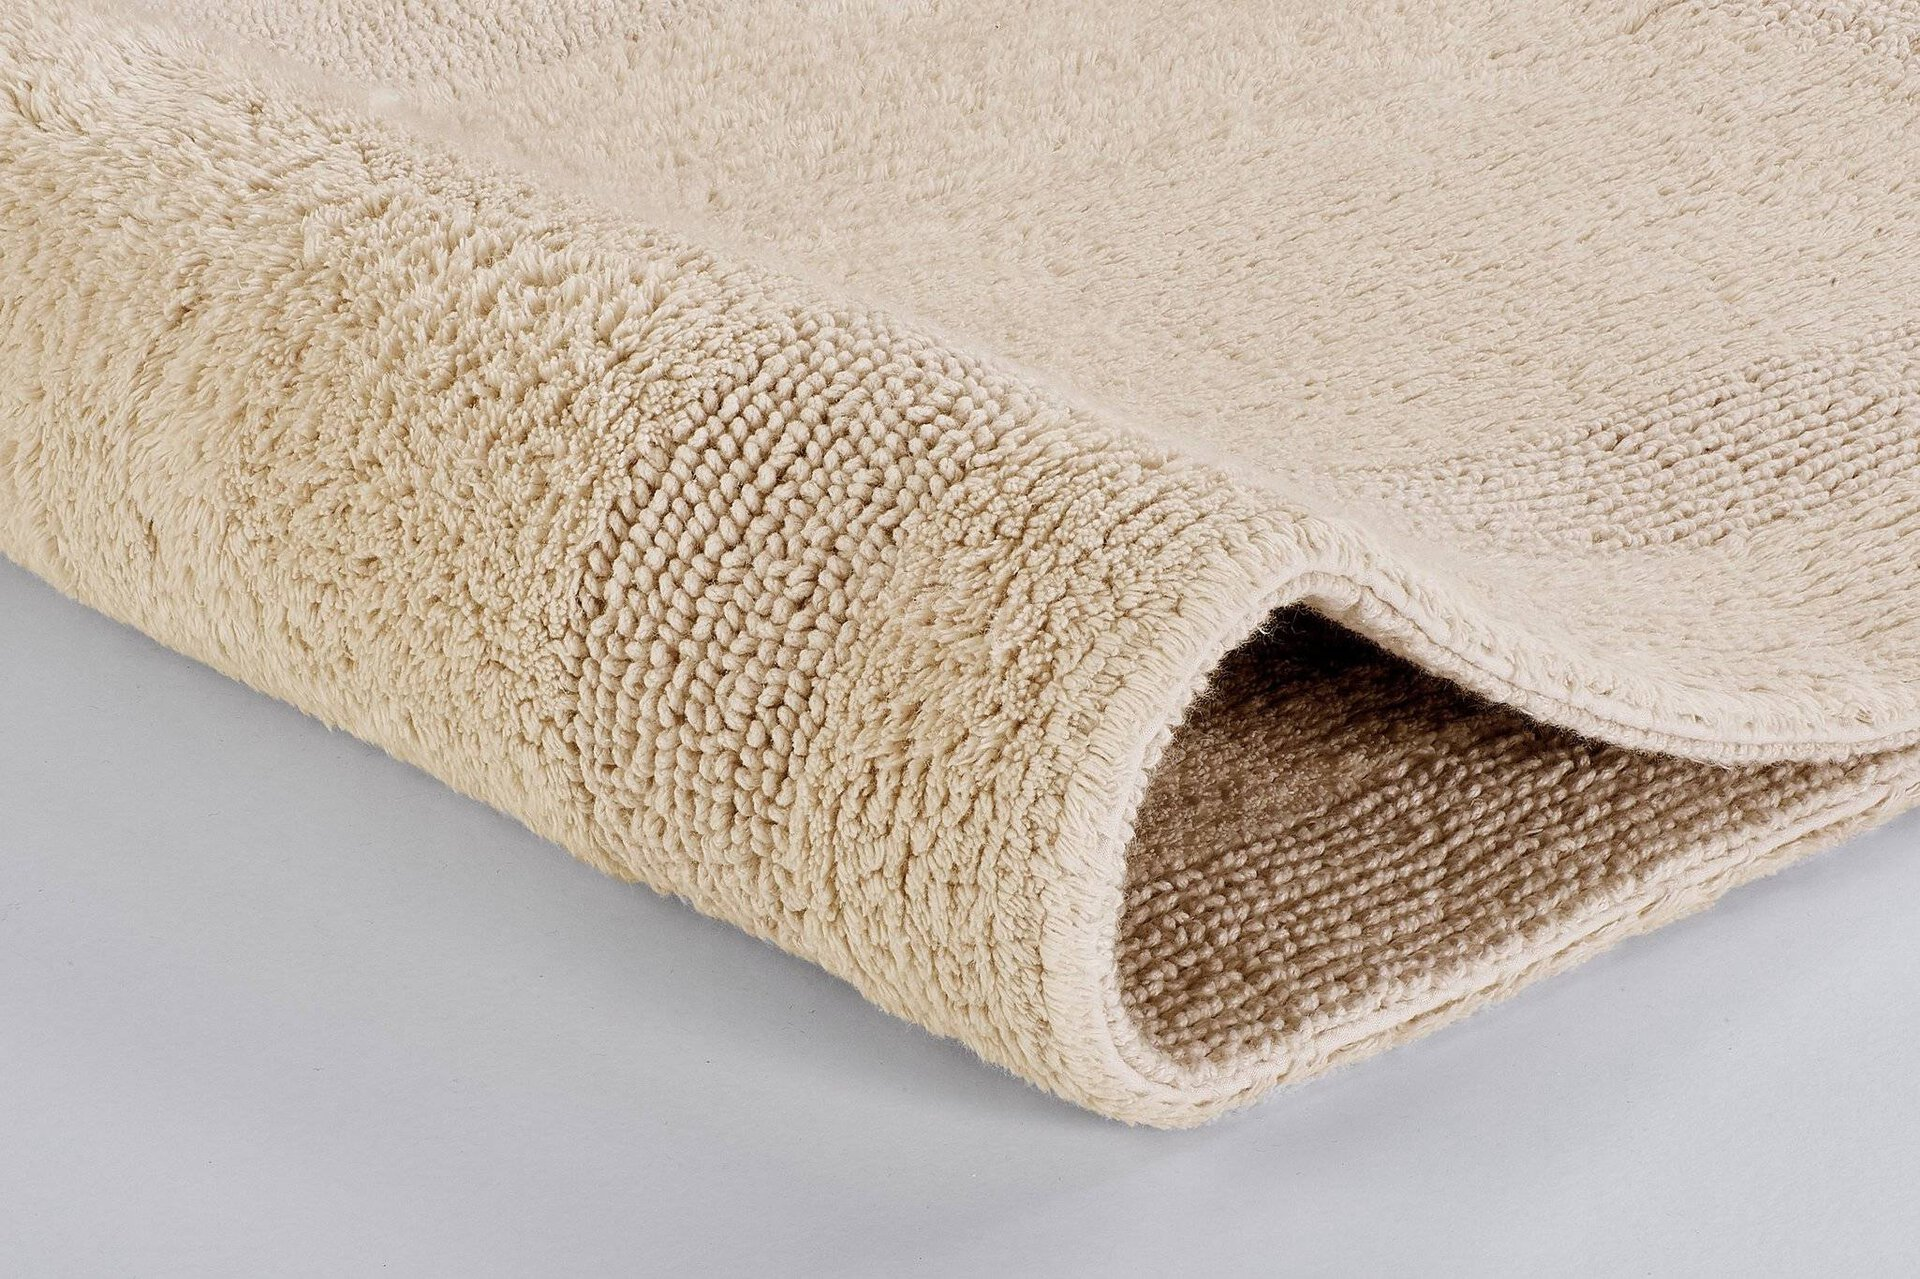 Badteppich Arizona Kleine Wolke Textil 65 x 2 x 55 cm